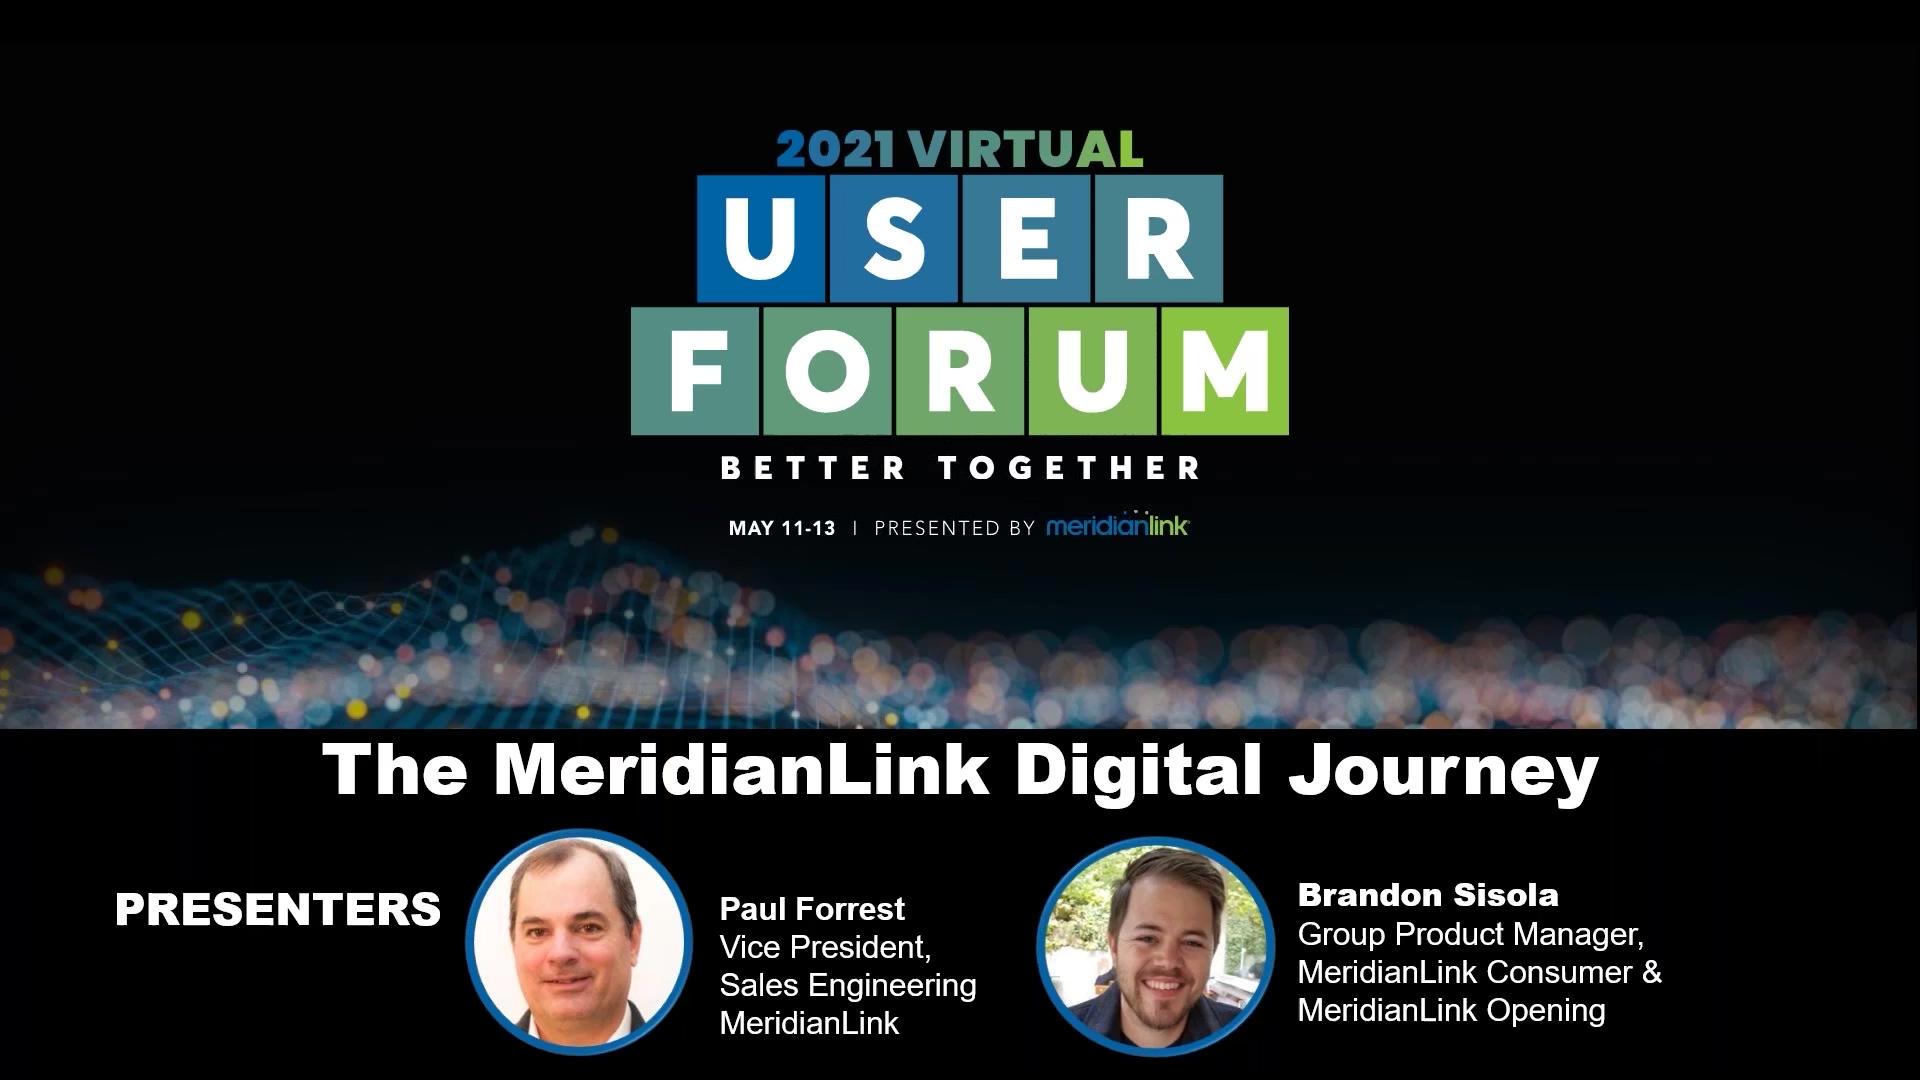 The MeridianLink Digital Journey